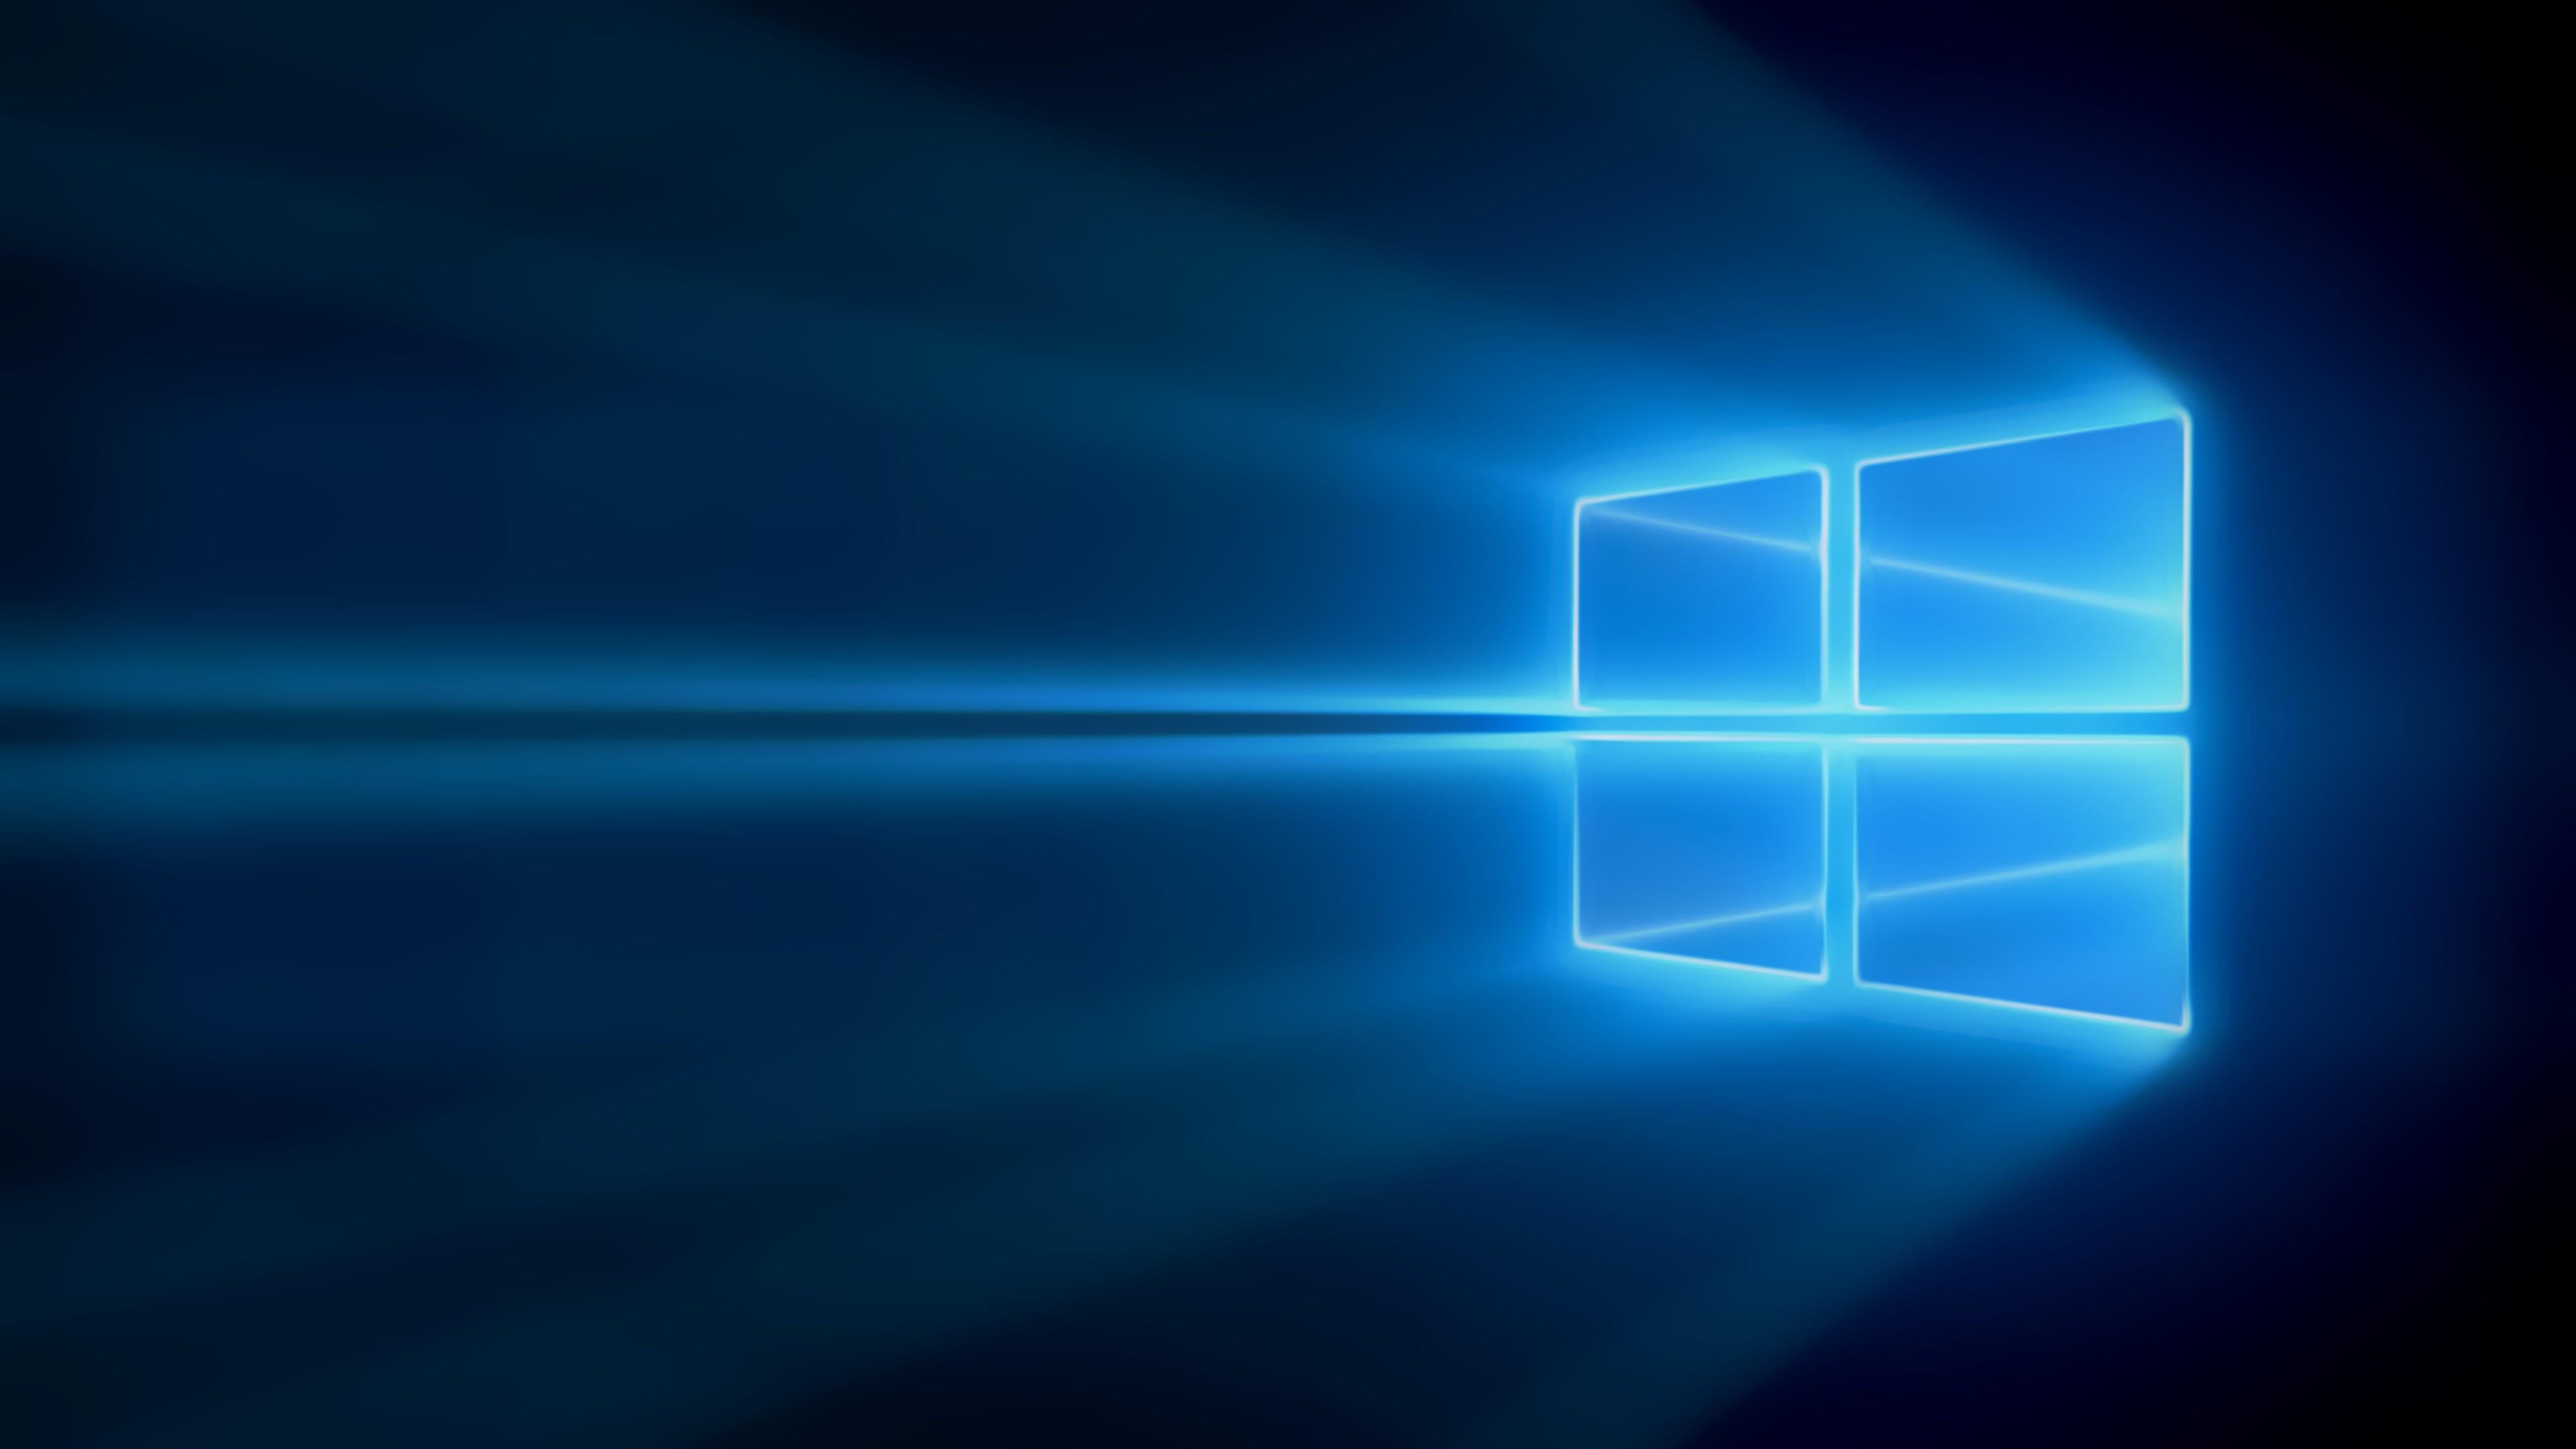 Windows 10 hero image remake 3840x2160